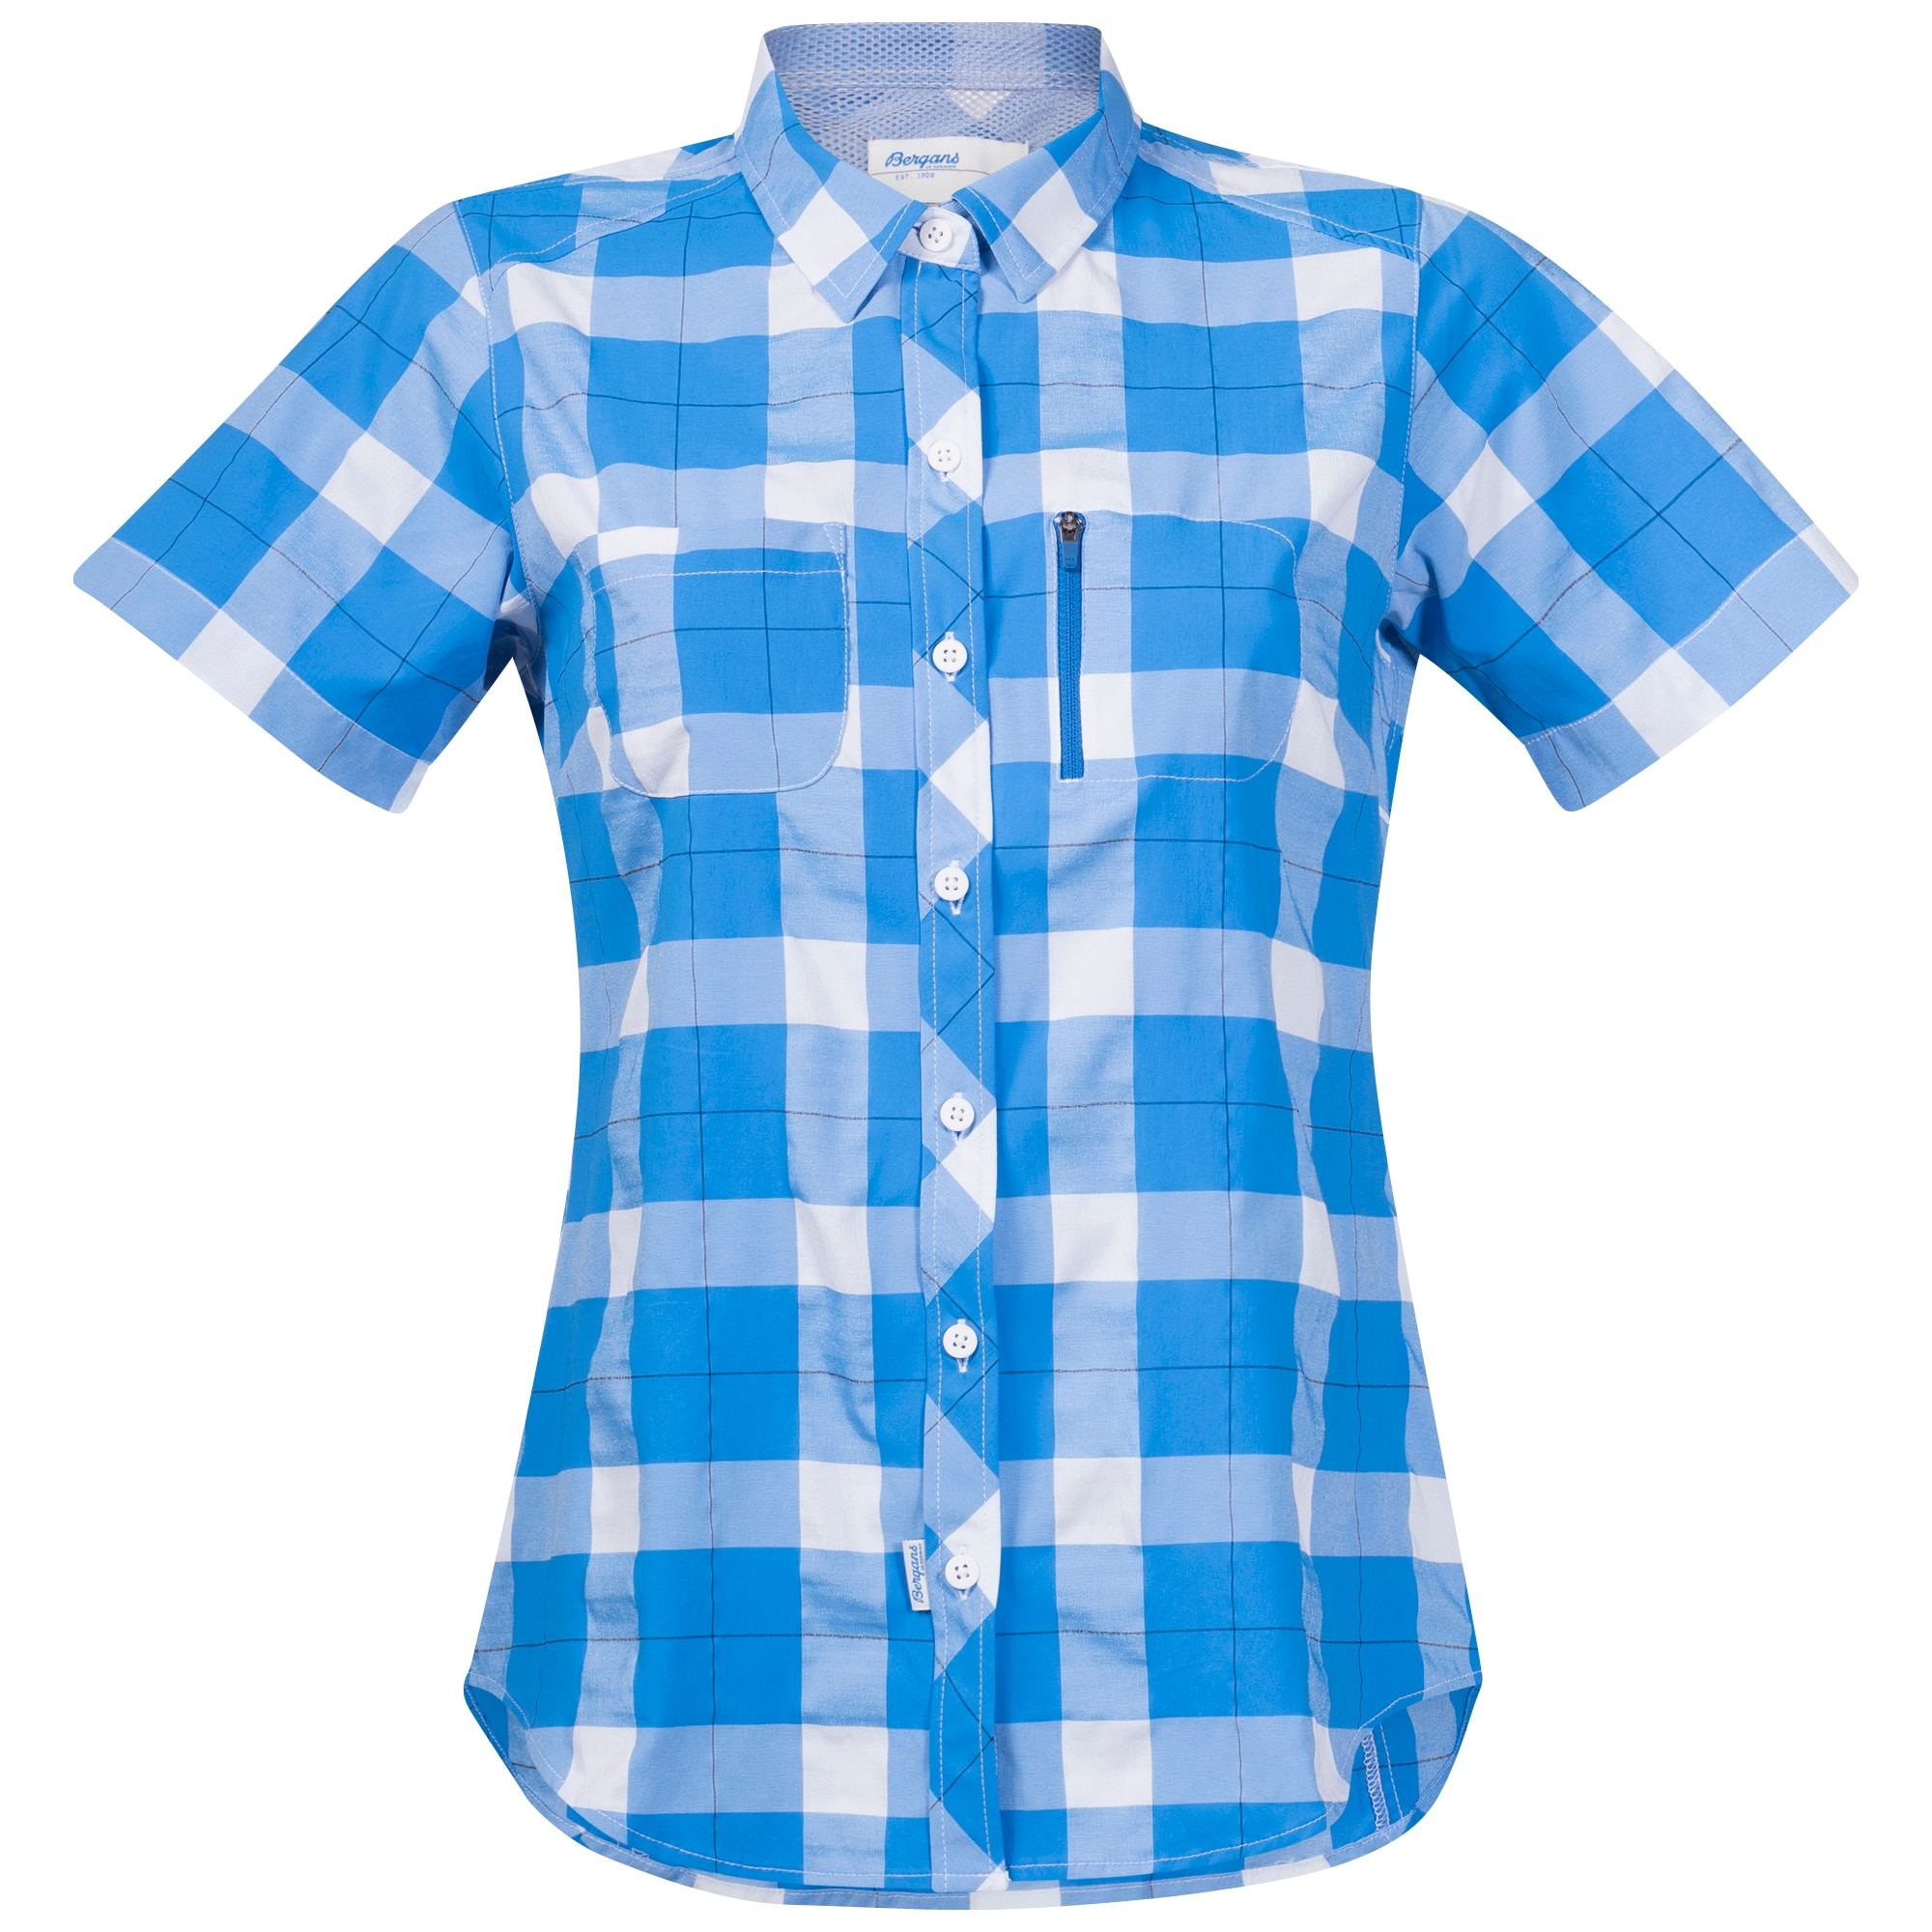 Jondal Lady Shirt Short Sleeve